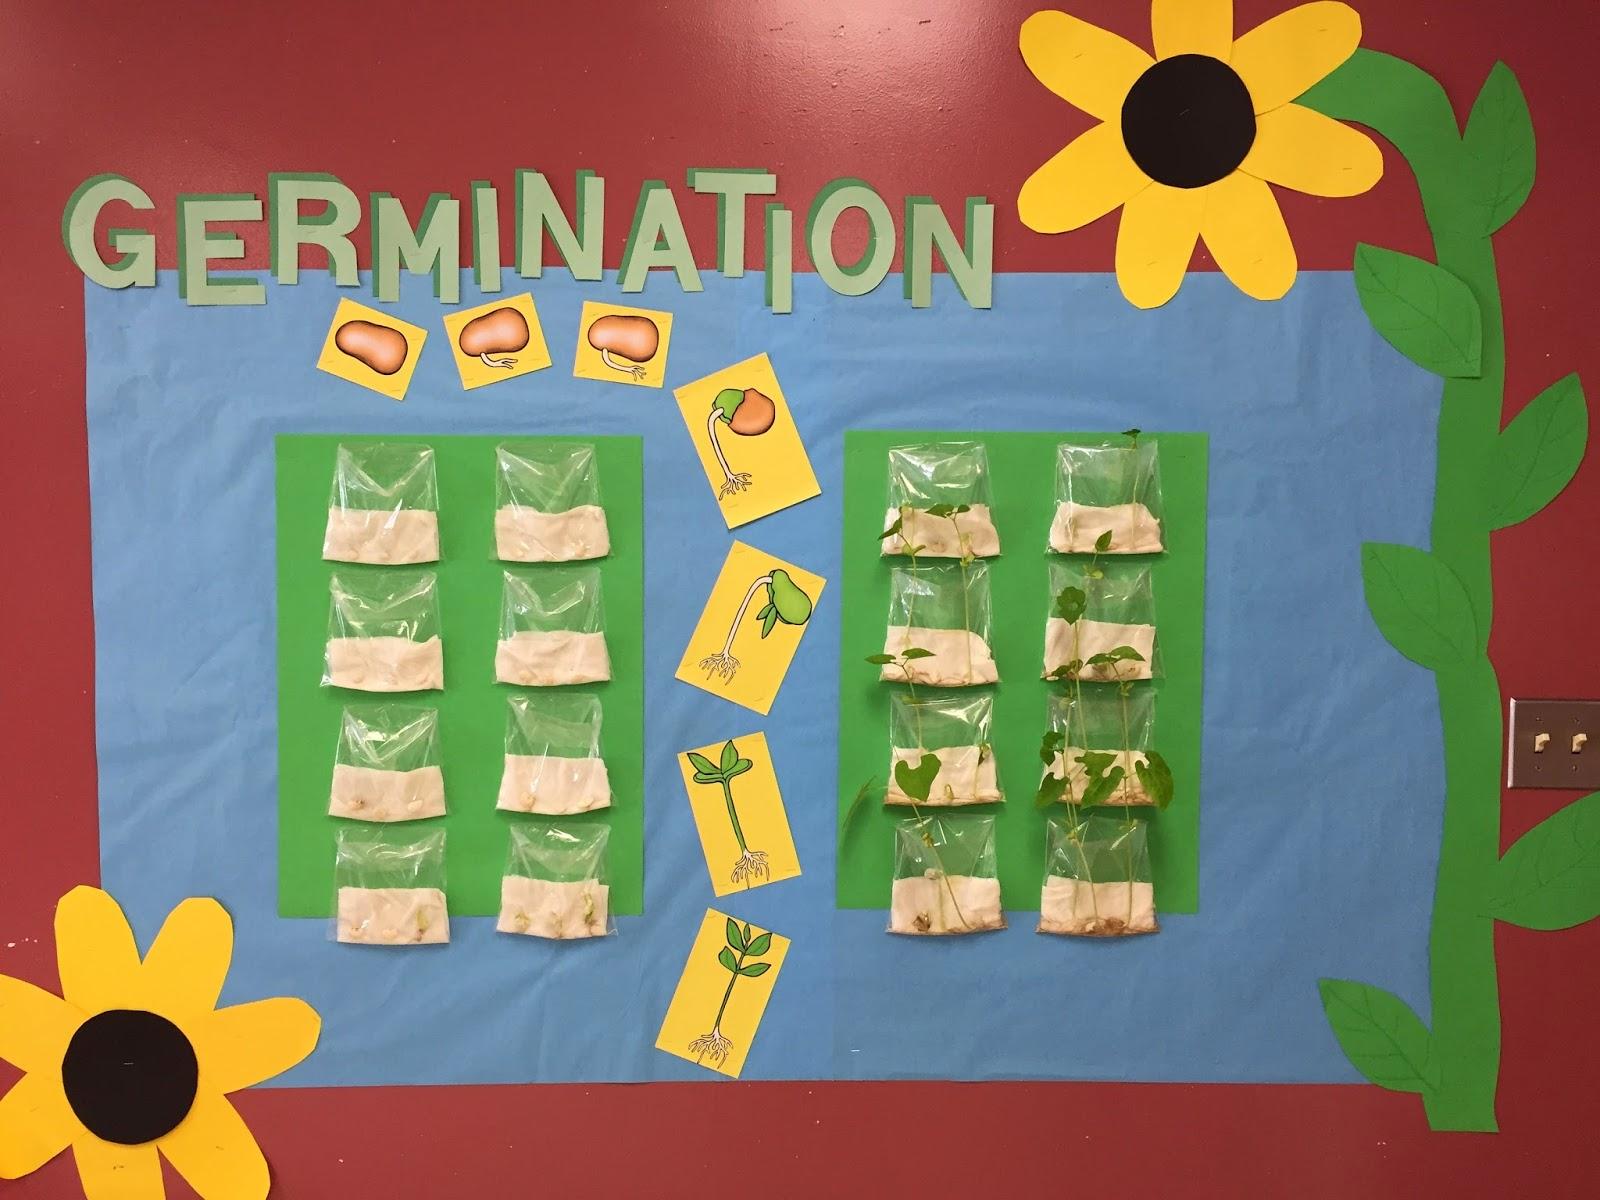 Teaching Seriously Germination A Living Bulletin Board